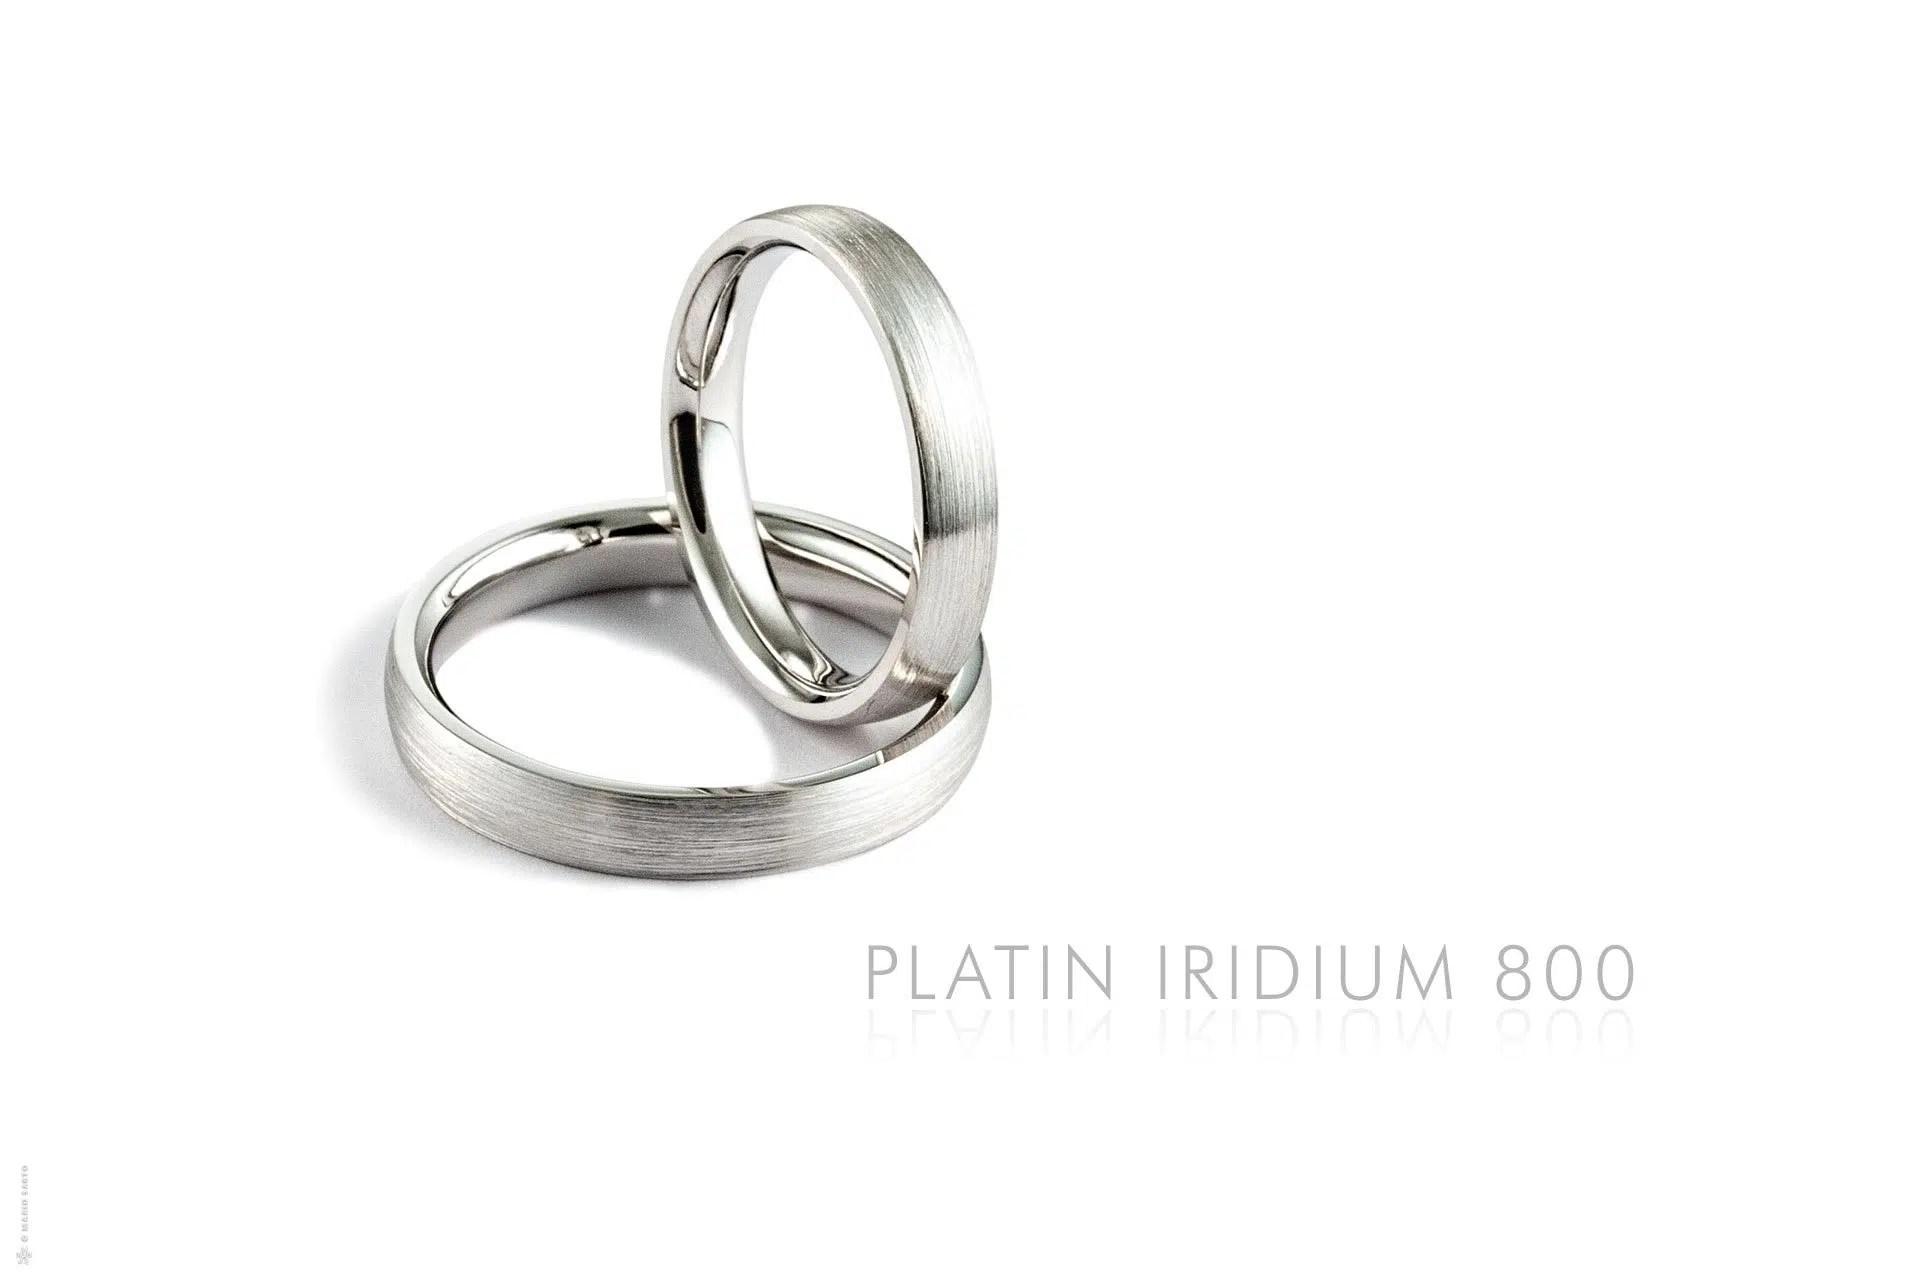 Platin Iridium 800  fr Trauringe  mehr  sARTo